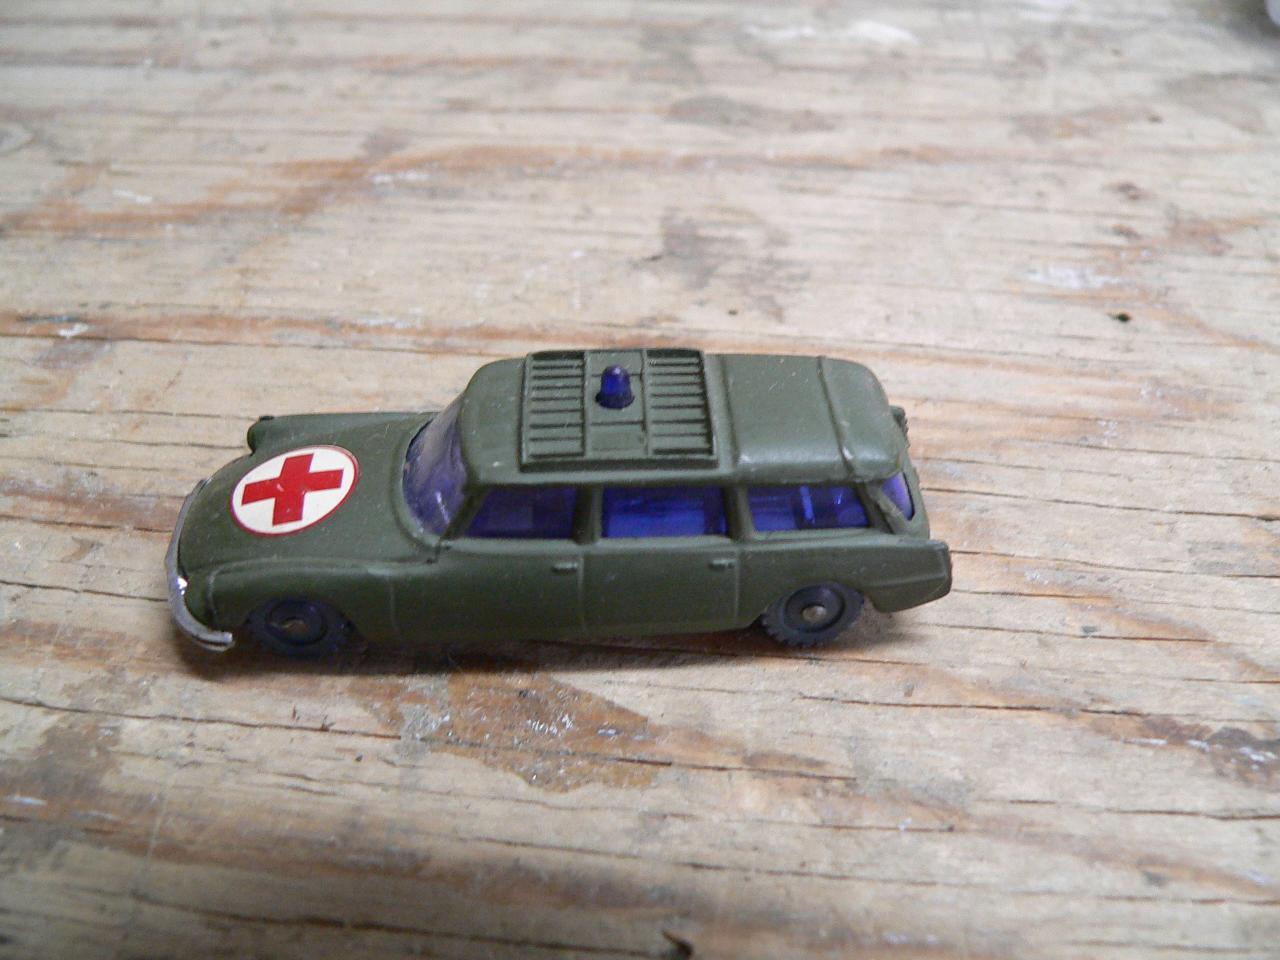 Citroen safari military ambulance # 4466.3